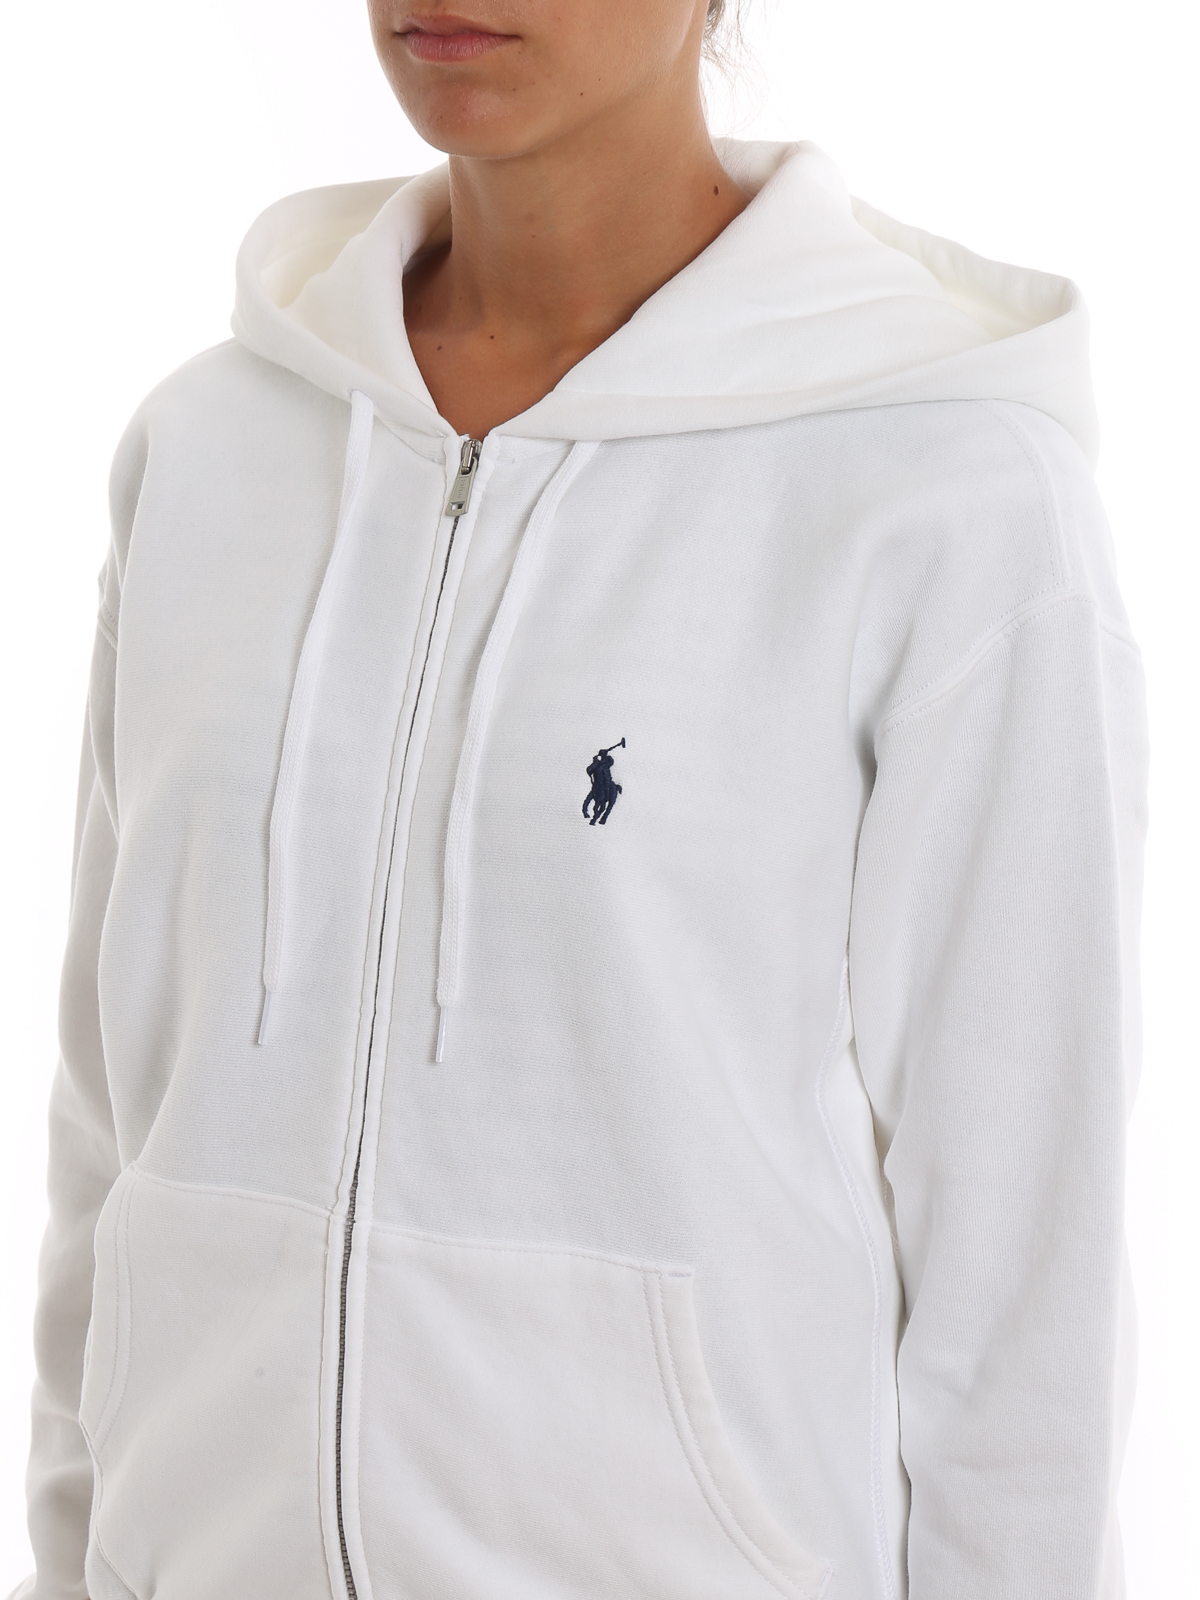 Polo Ralph Lauren Logo Embroidered Hoodie | Sudaderas ralph